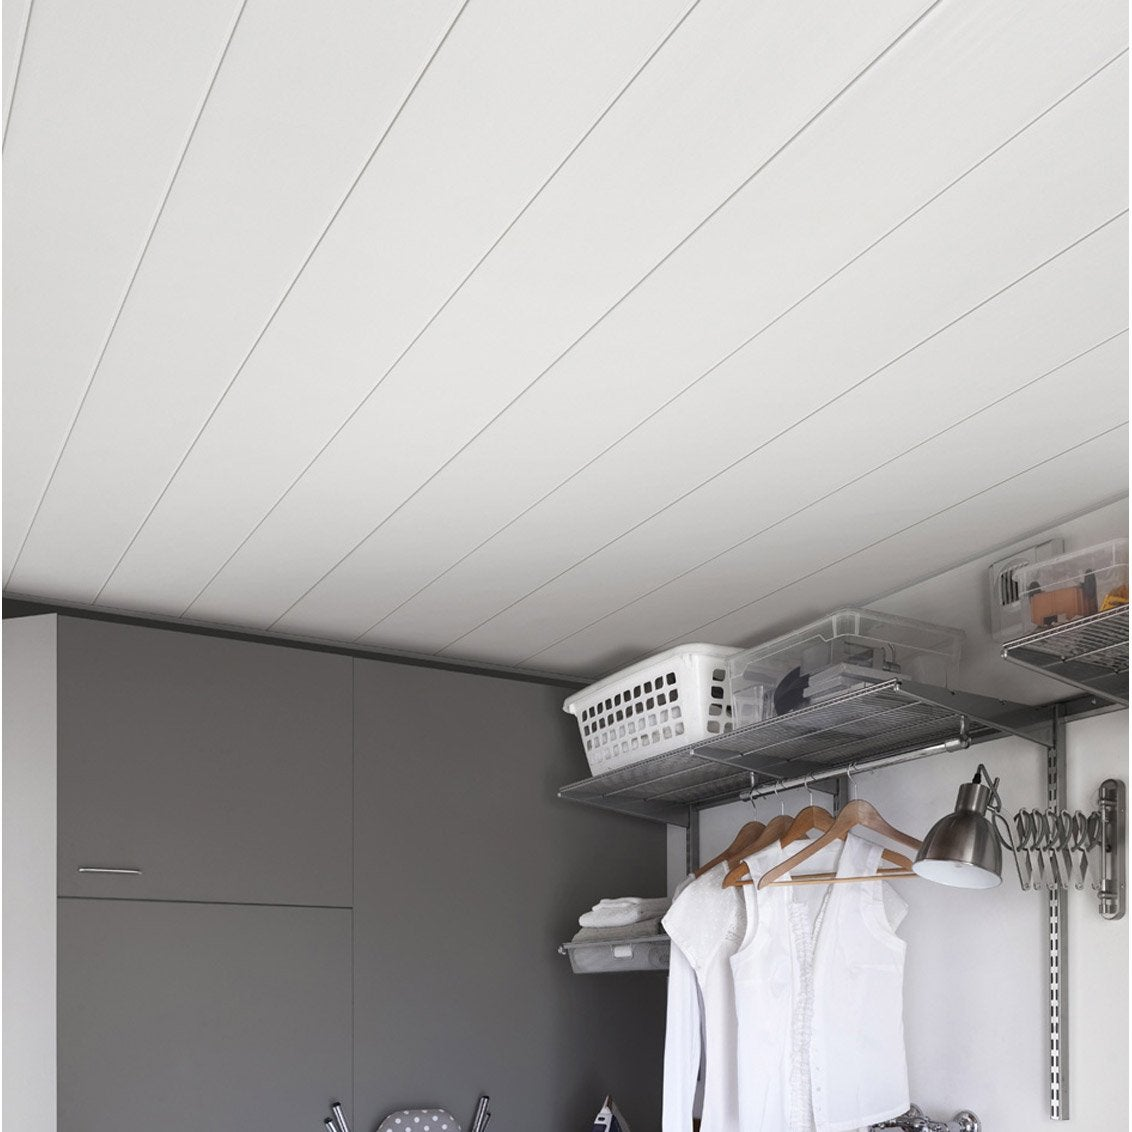 Lambris pvc blanc brut grosfillex line 3000 x cm x ep 8 mm leroy merlin - Lambris pvc grosfillex ...